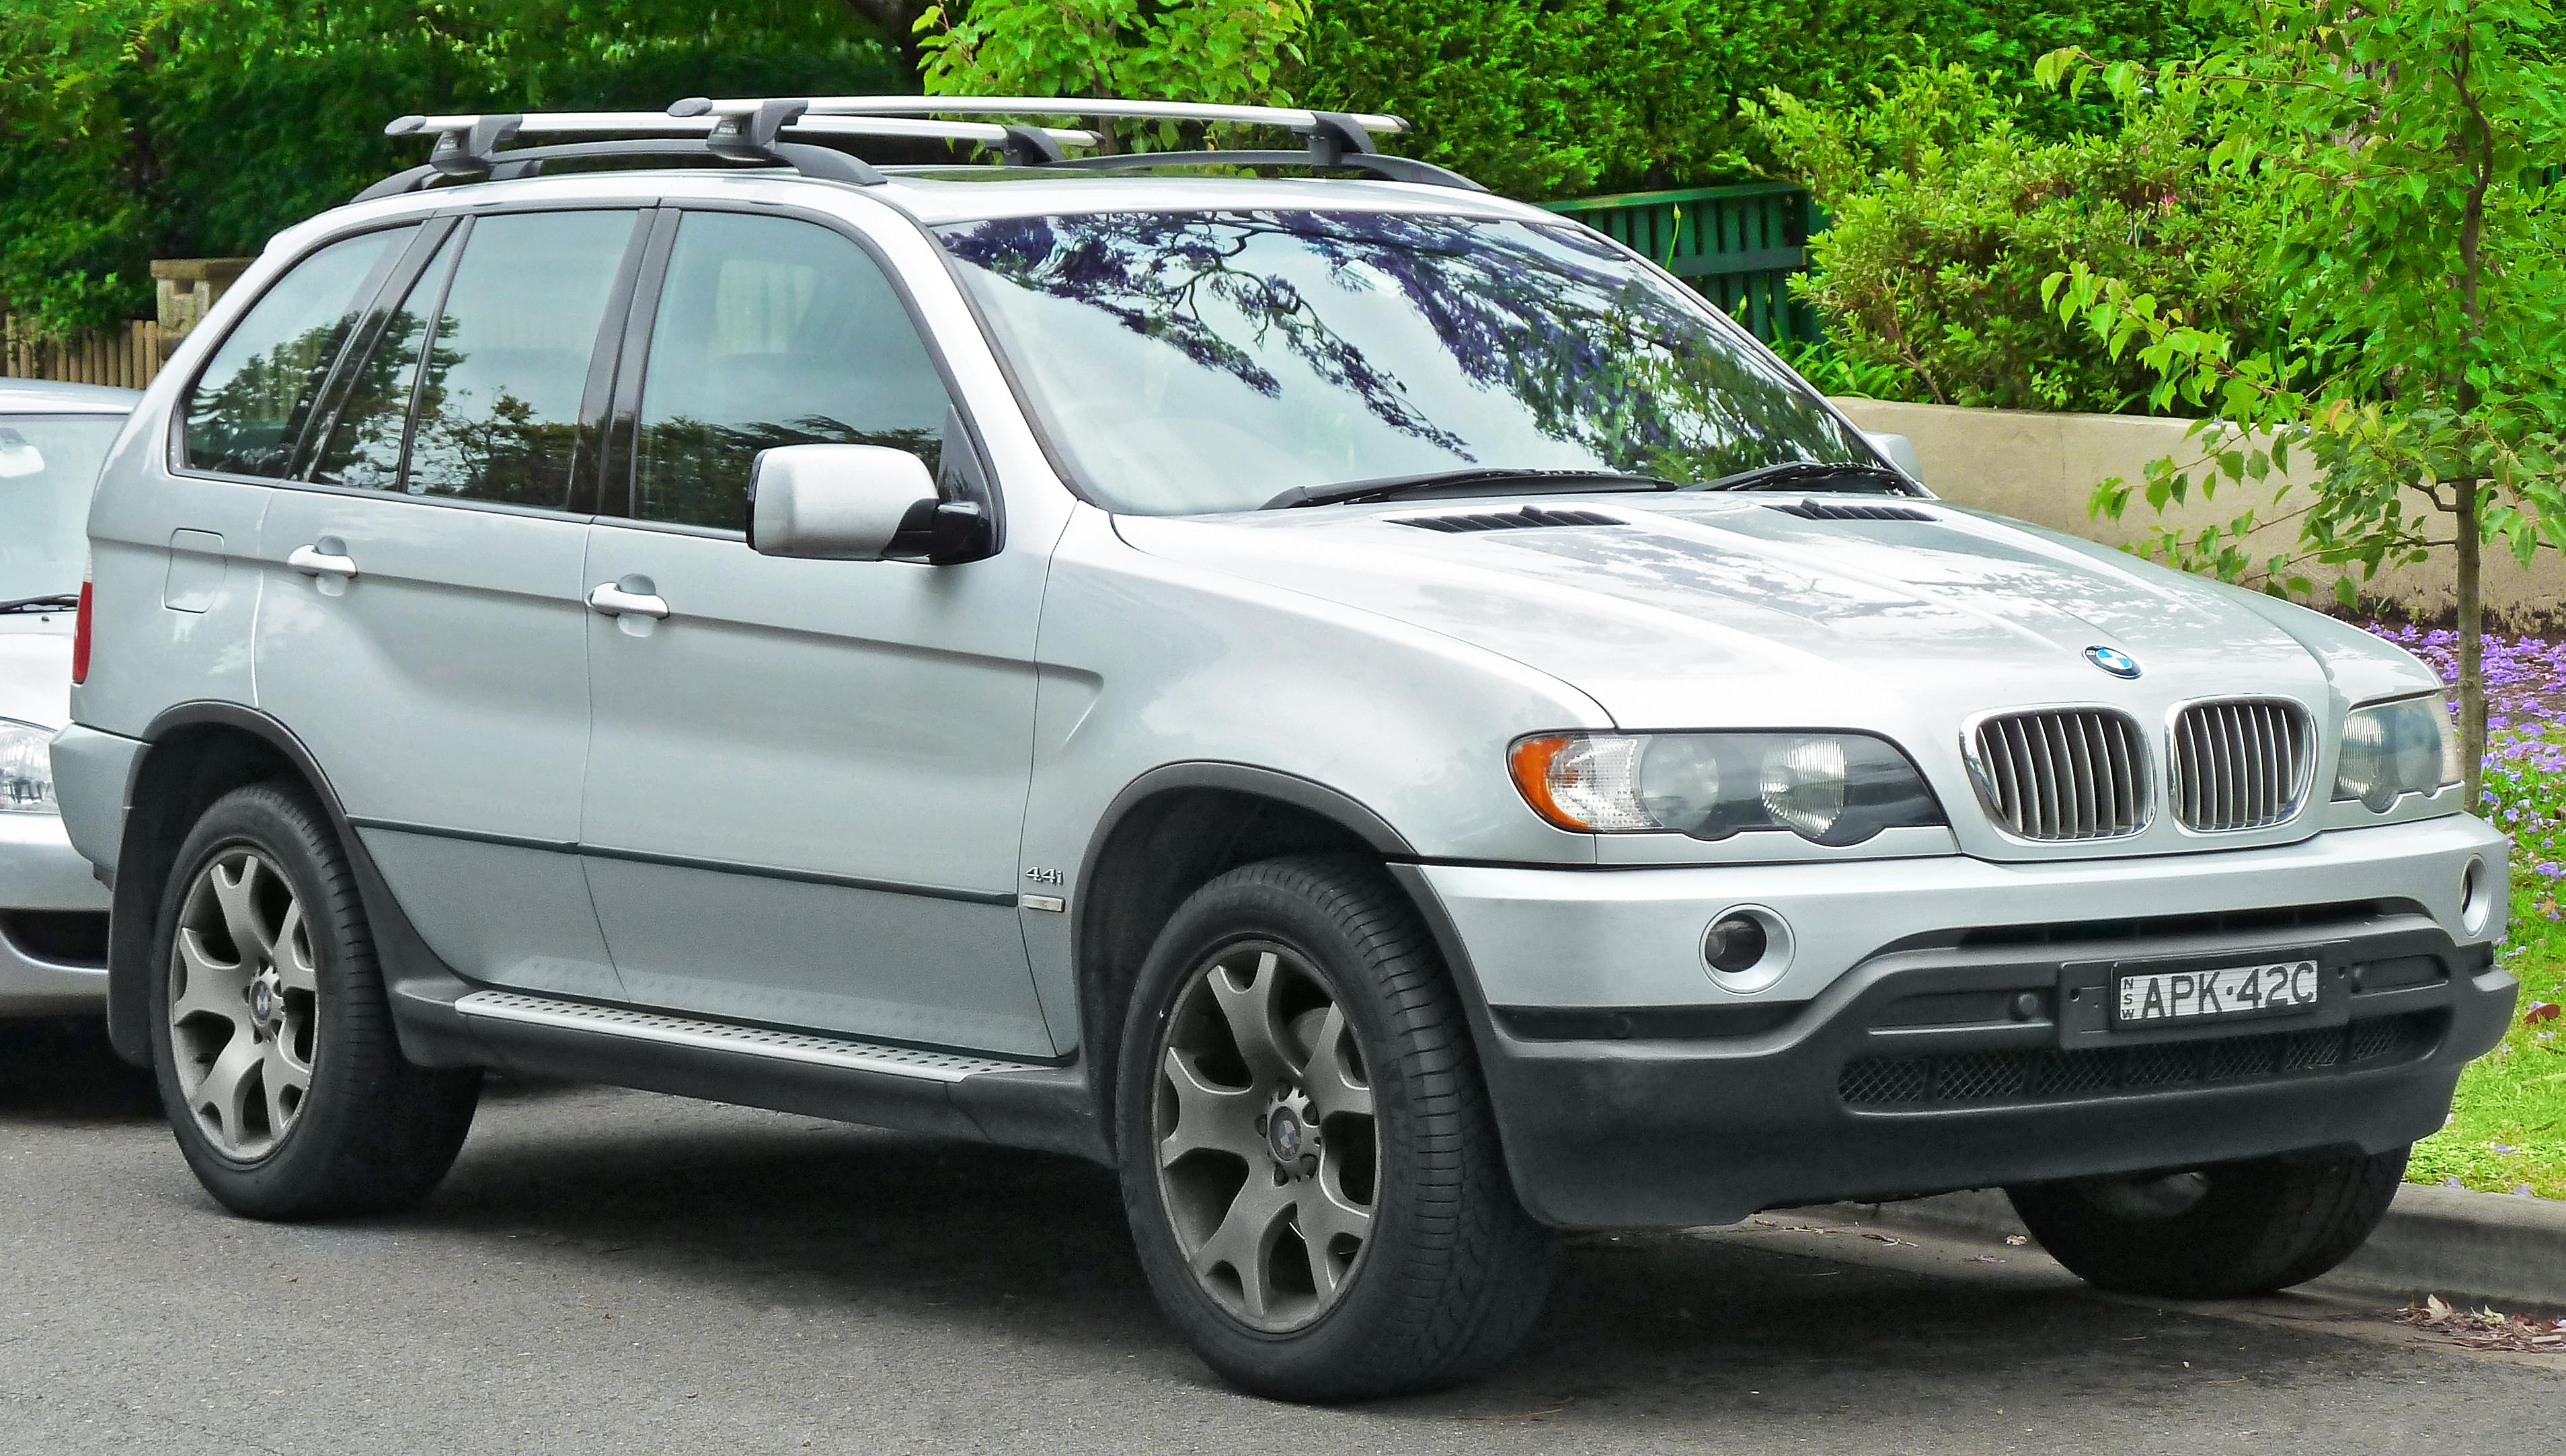 BMW X5 I (E53) 1999 - 2003 SUV 5 door #1